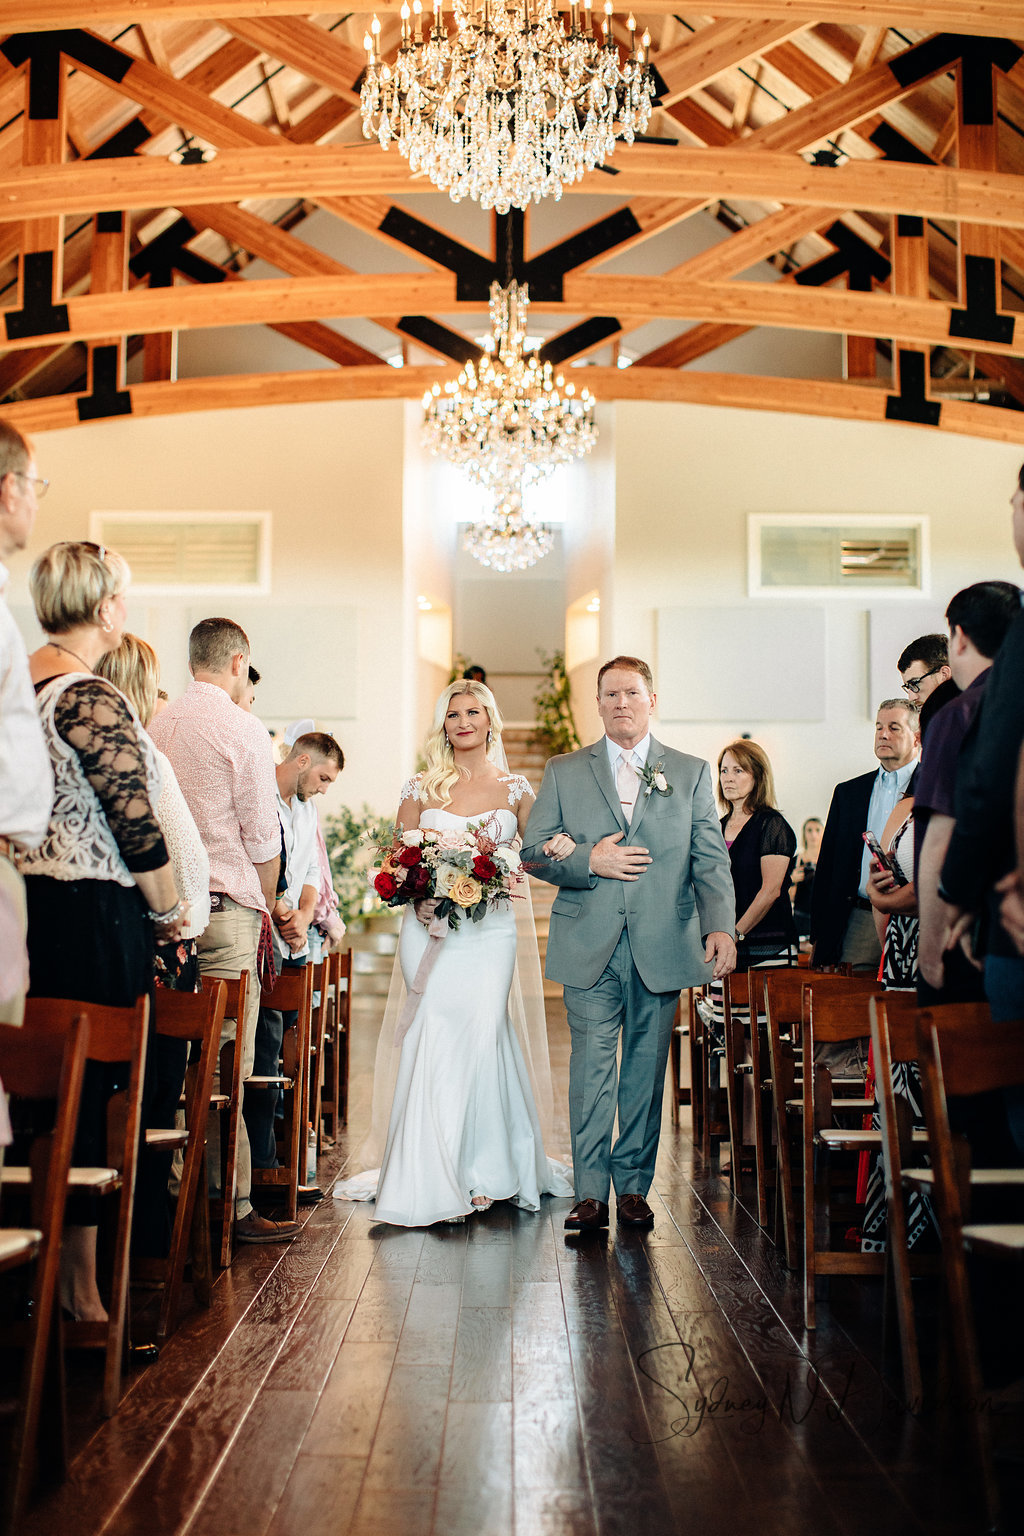 sydney-davidson-wedding-stillwater-oklahoma-wedding-session-traveling-photographer-portrait-tulsa-oklahoma-2945.jpg